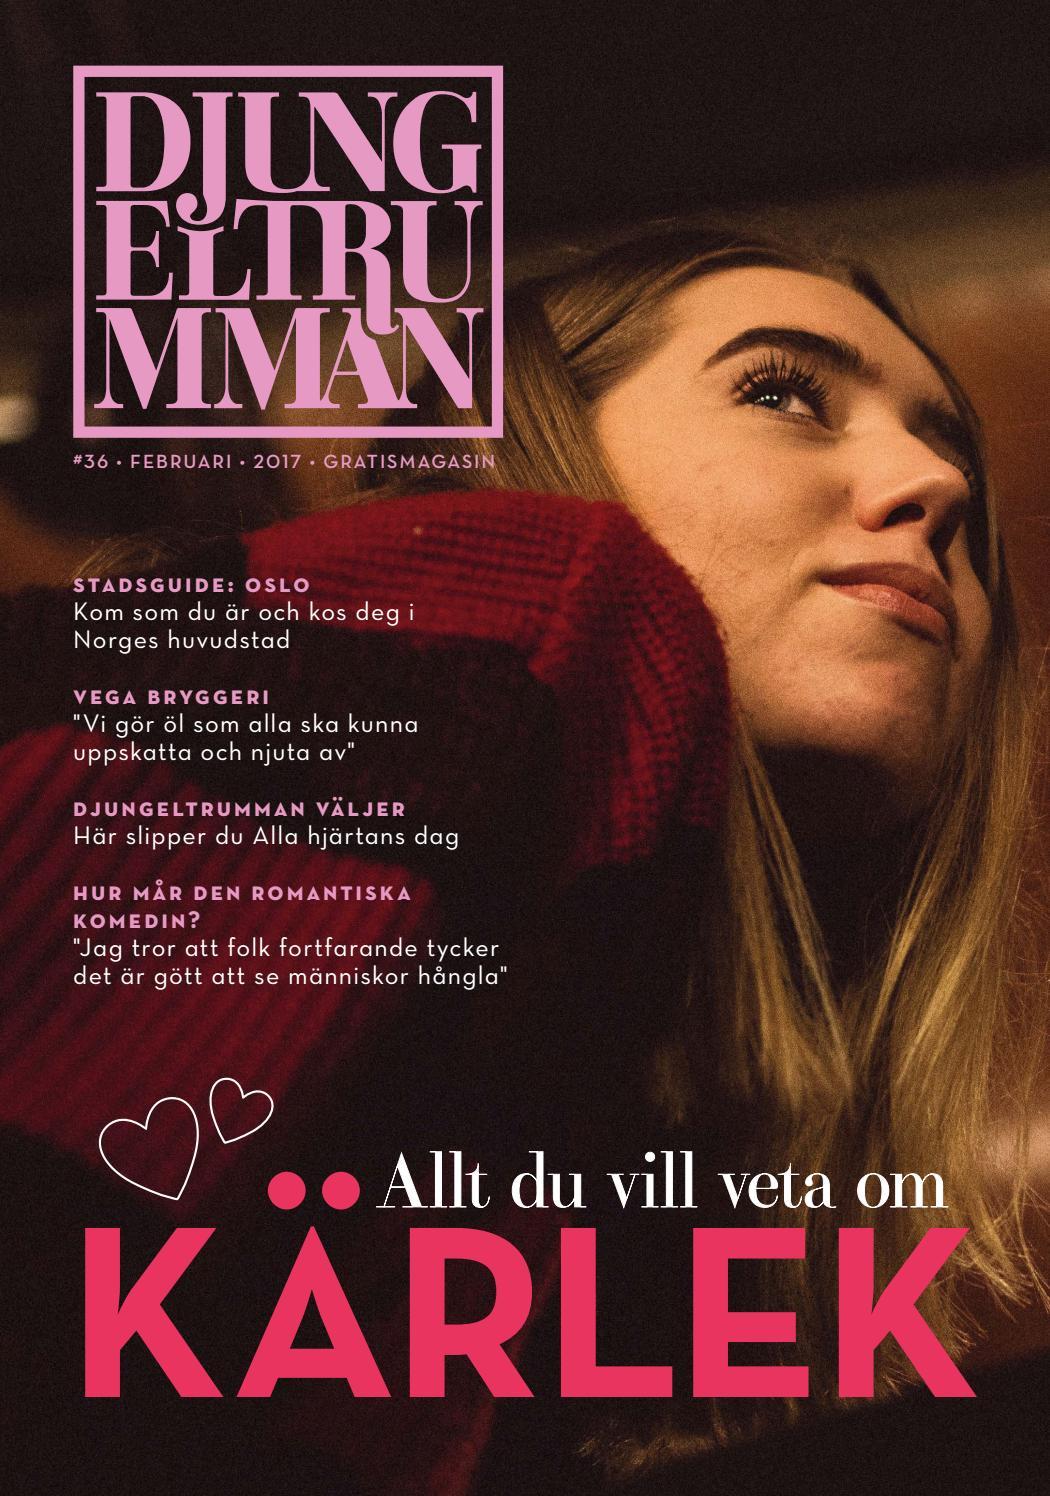 Spel erotik modelle puma sex i stockholm hngbrst